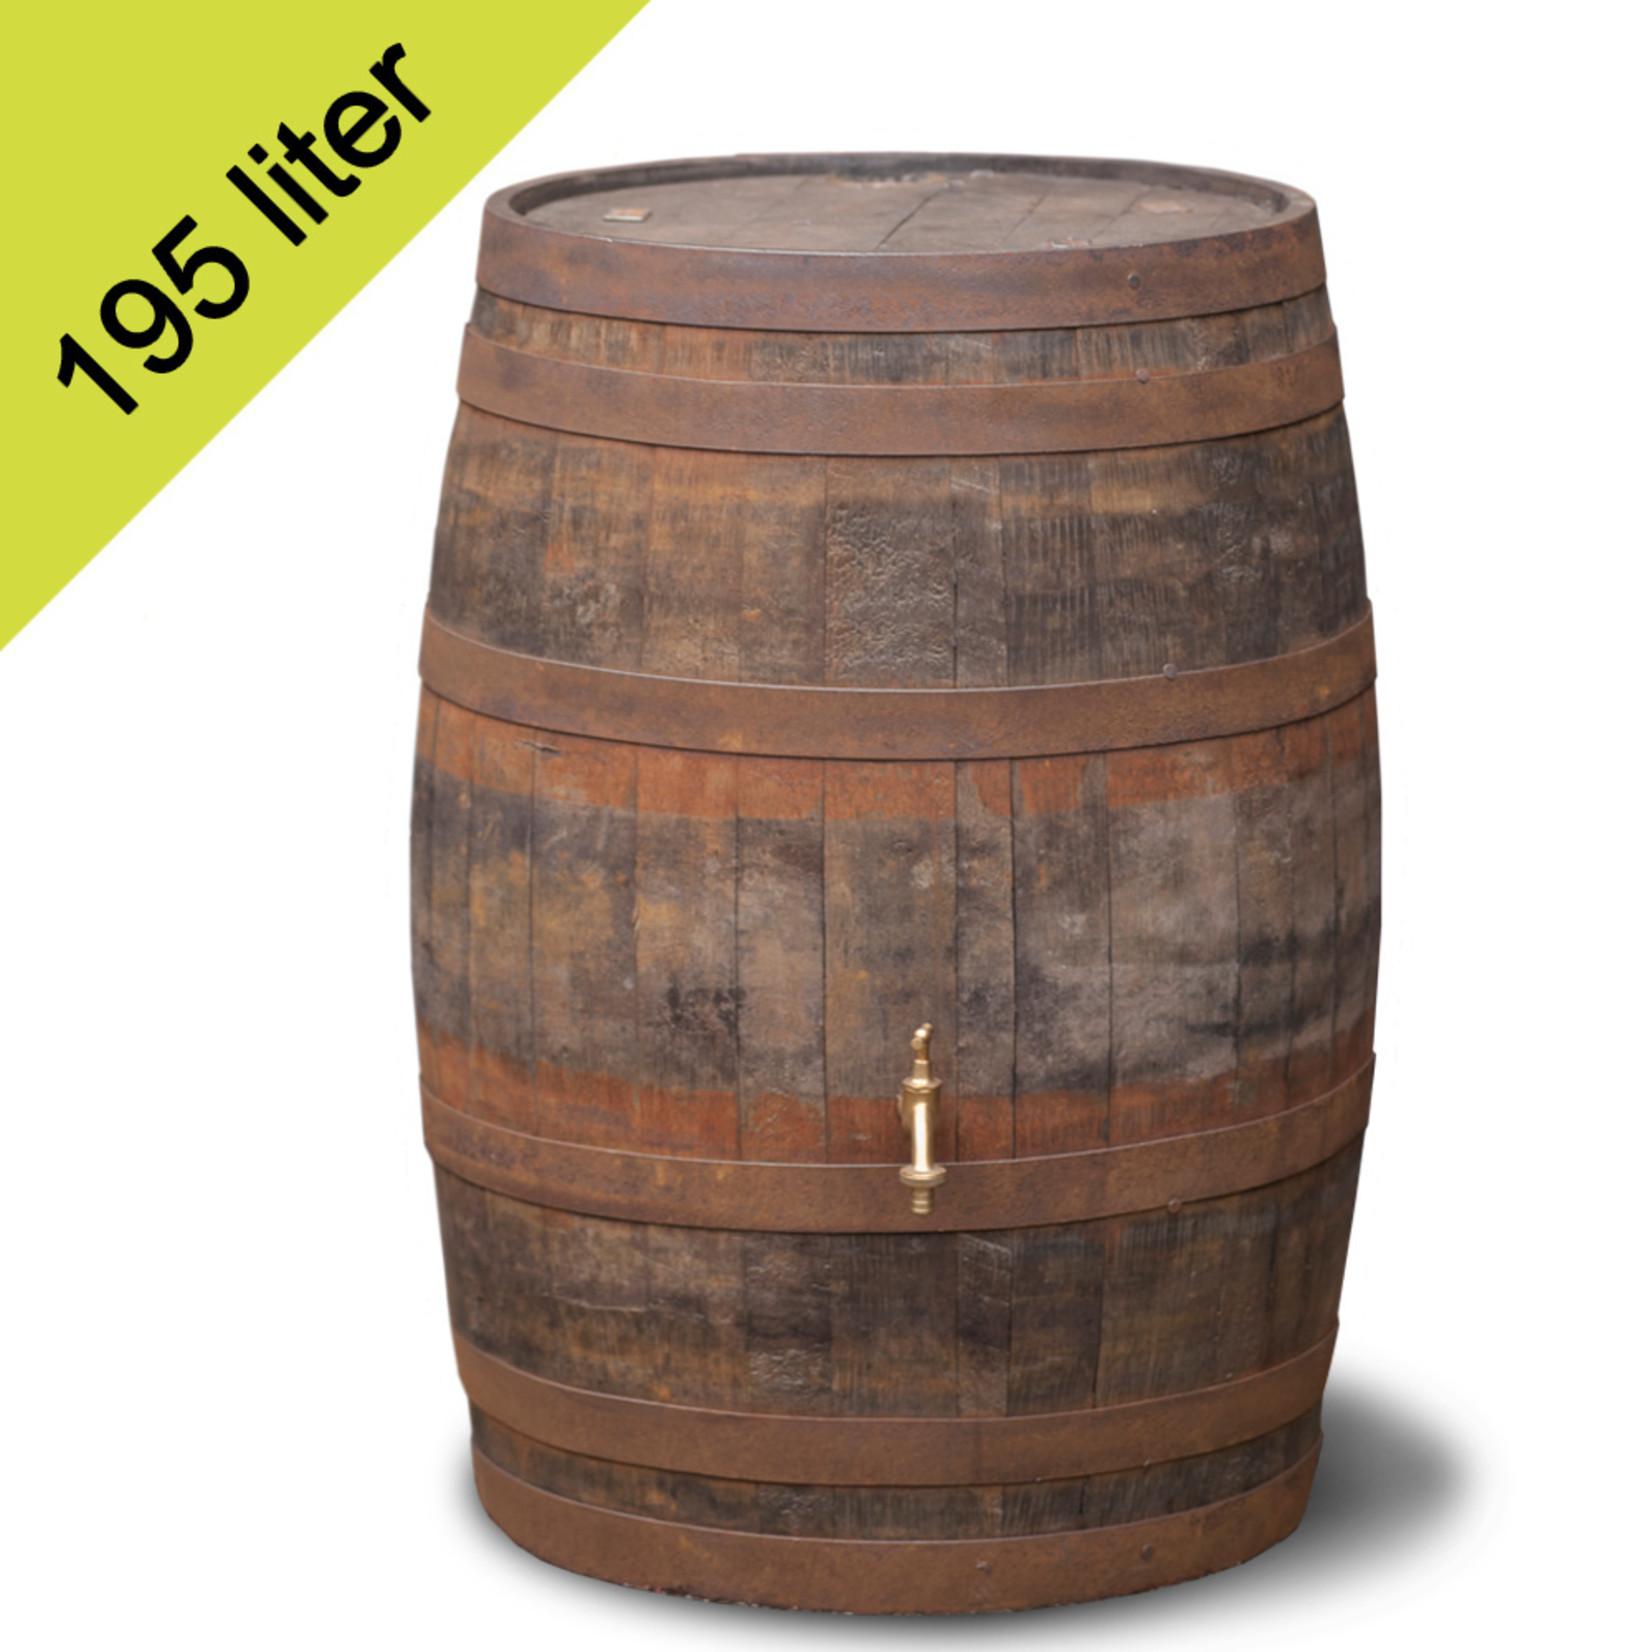 Meuwissen Agro Ton Whiskey 195 liter hergebruik GEBORSTELD